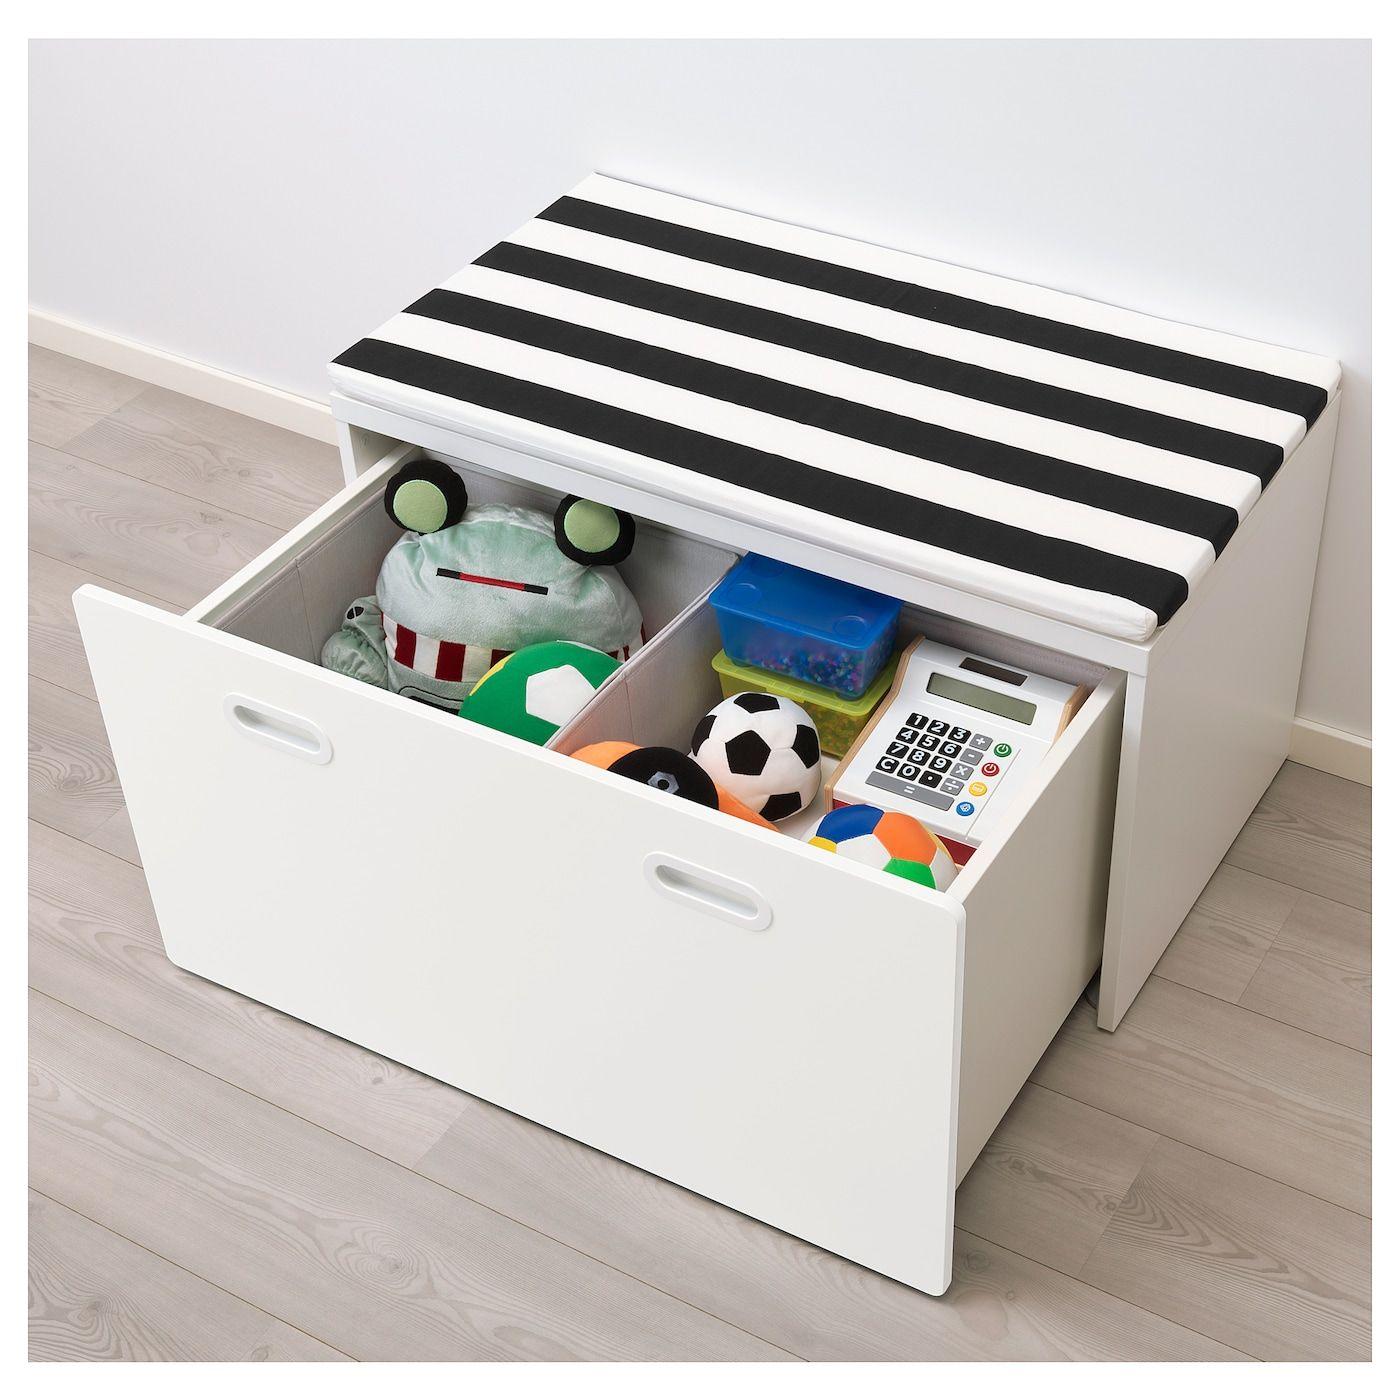 Stuva Fritids Bench With Toy Storage White White Ikea Rangement Jouet Banc De Rangement Rangement Salle De Jeux